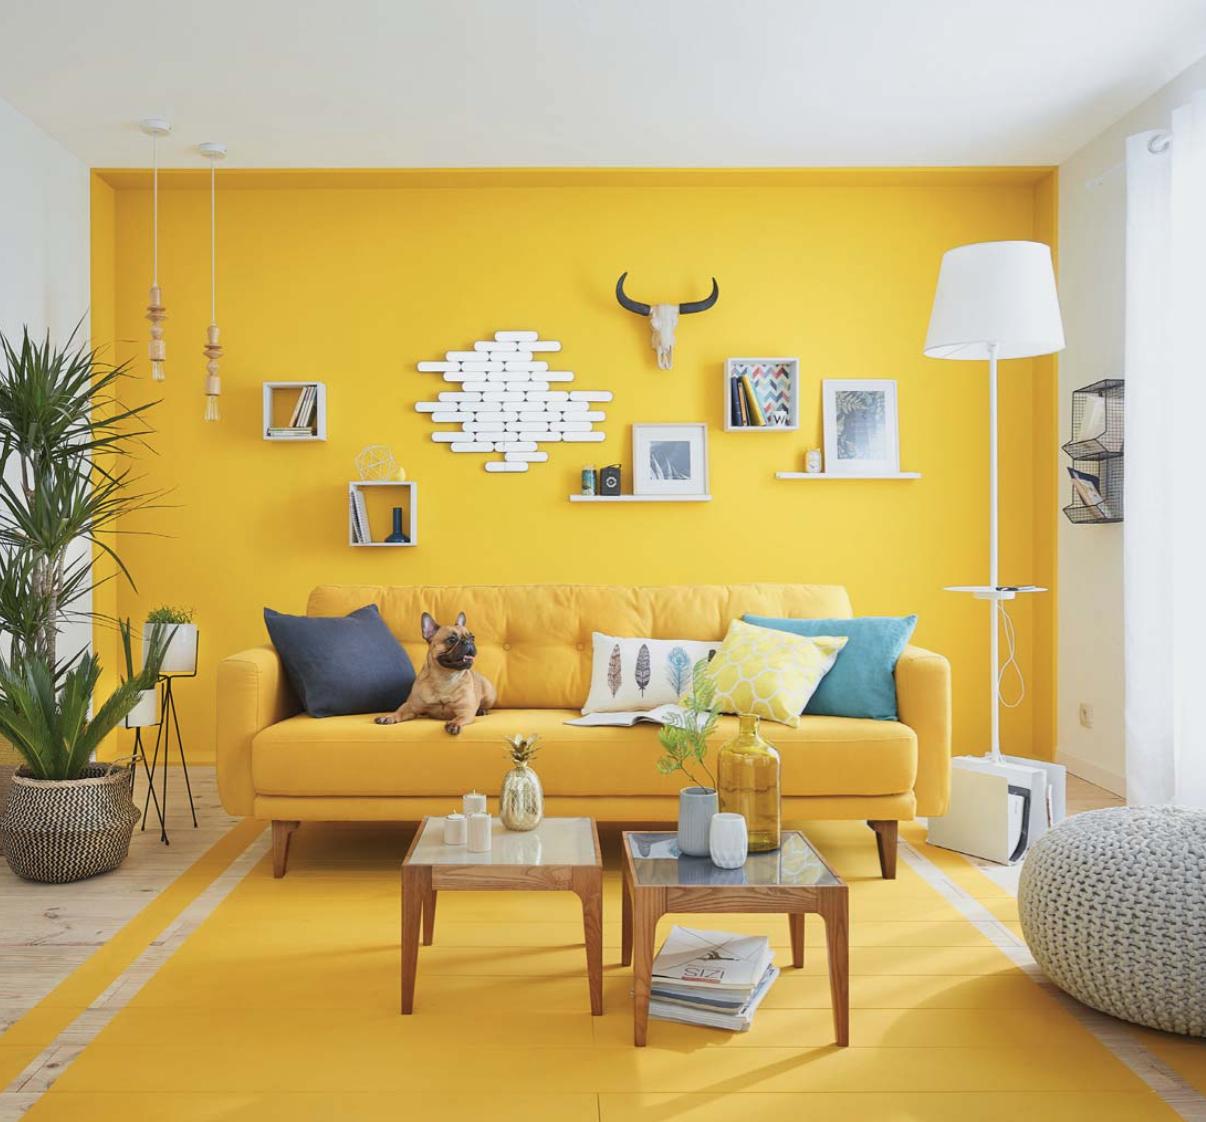 Salon Jaune Salon Jaune Room Wall Painting Yellow Walls